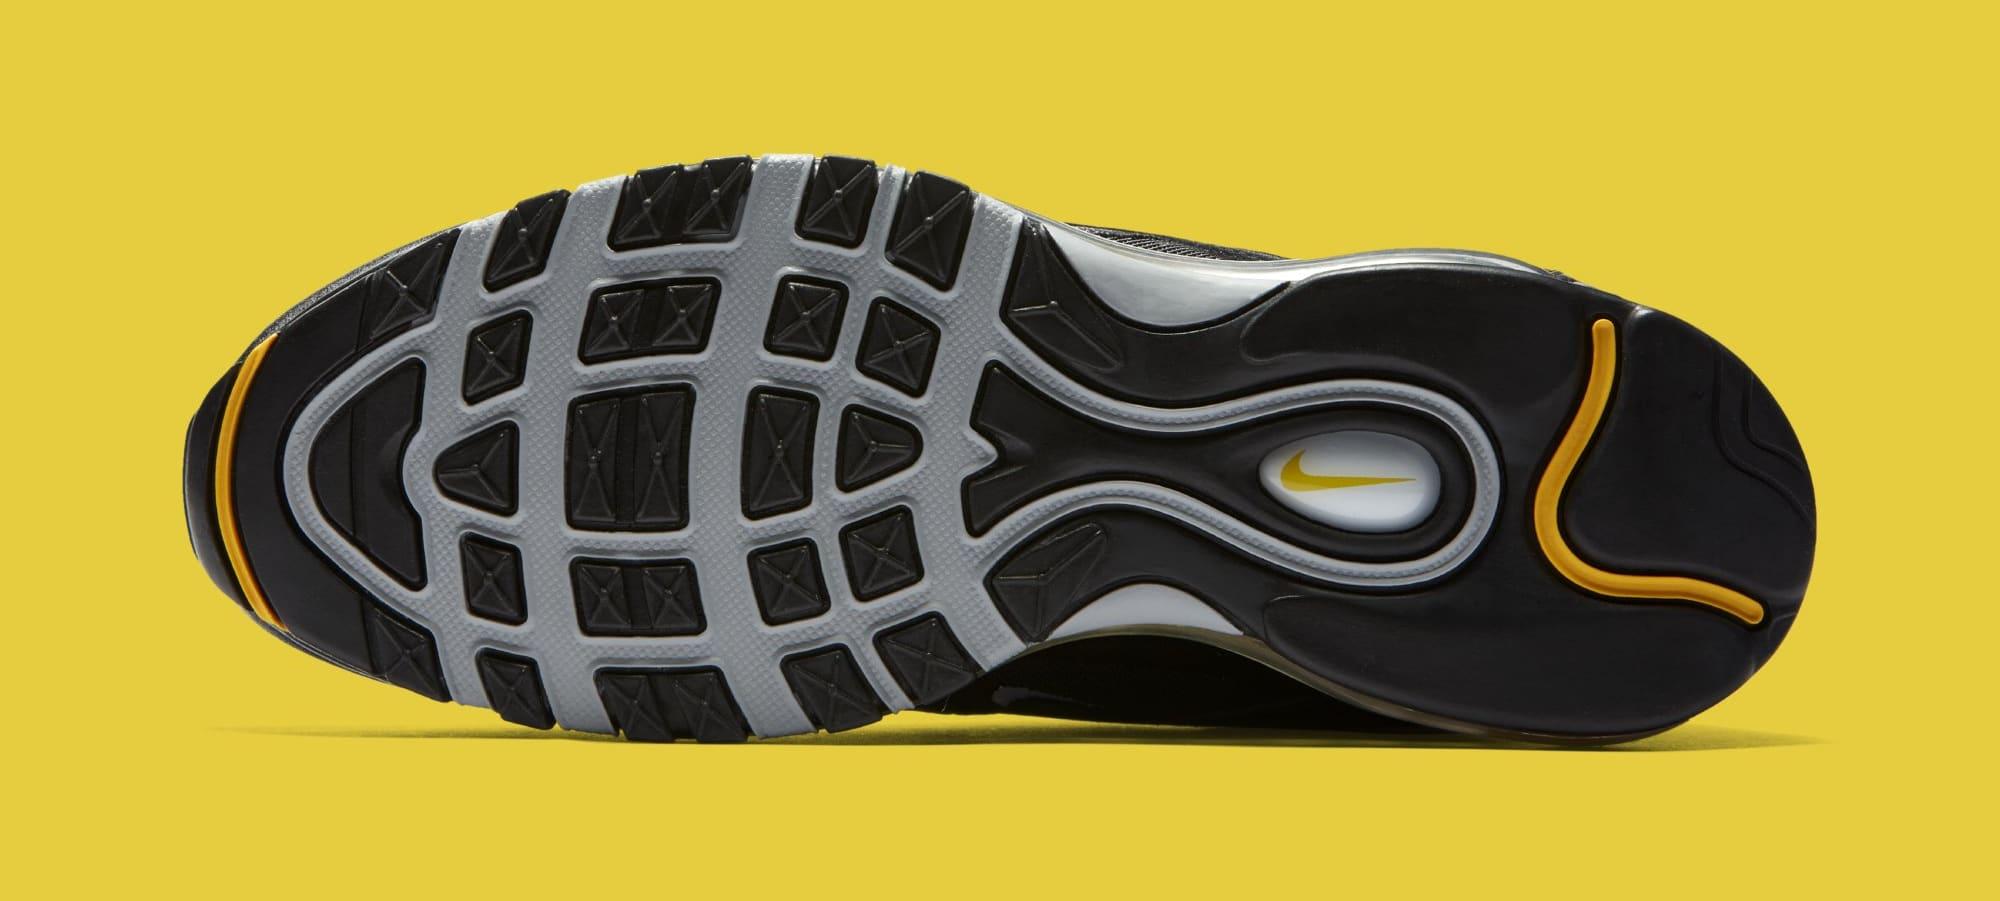 8a8e047ca142b4 Nike Air Max 97 Black White Amarillo 921826-008 Launch Date - The ...